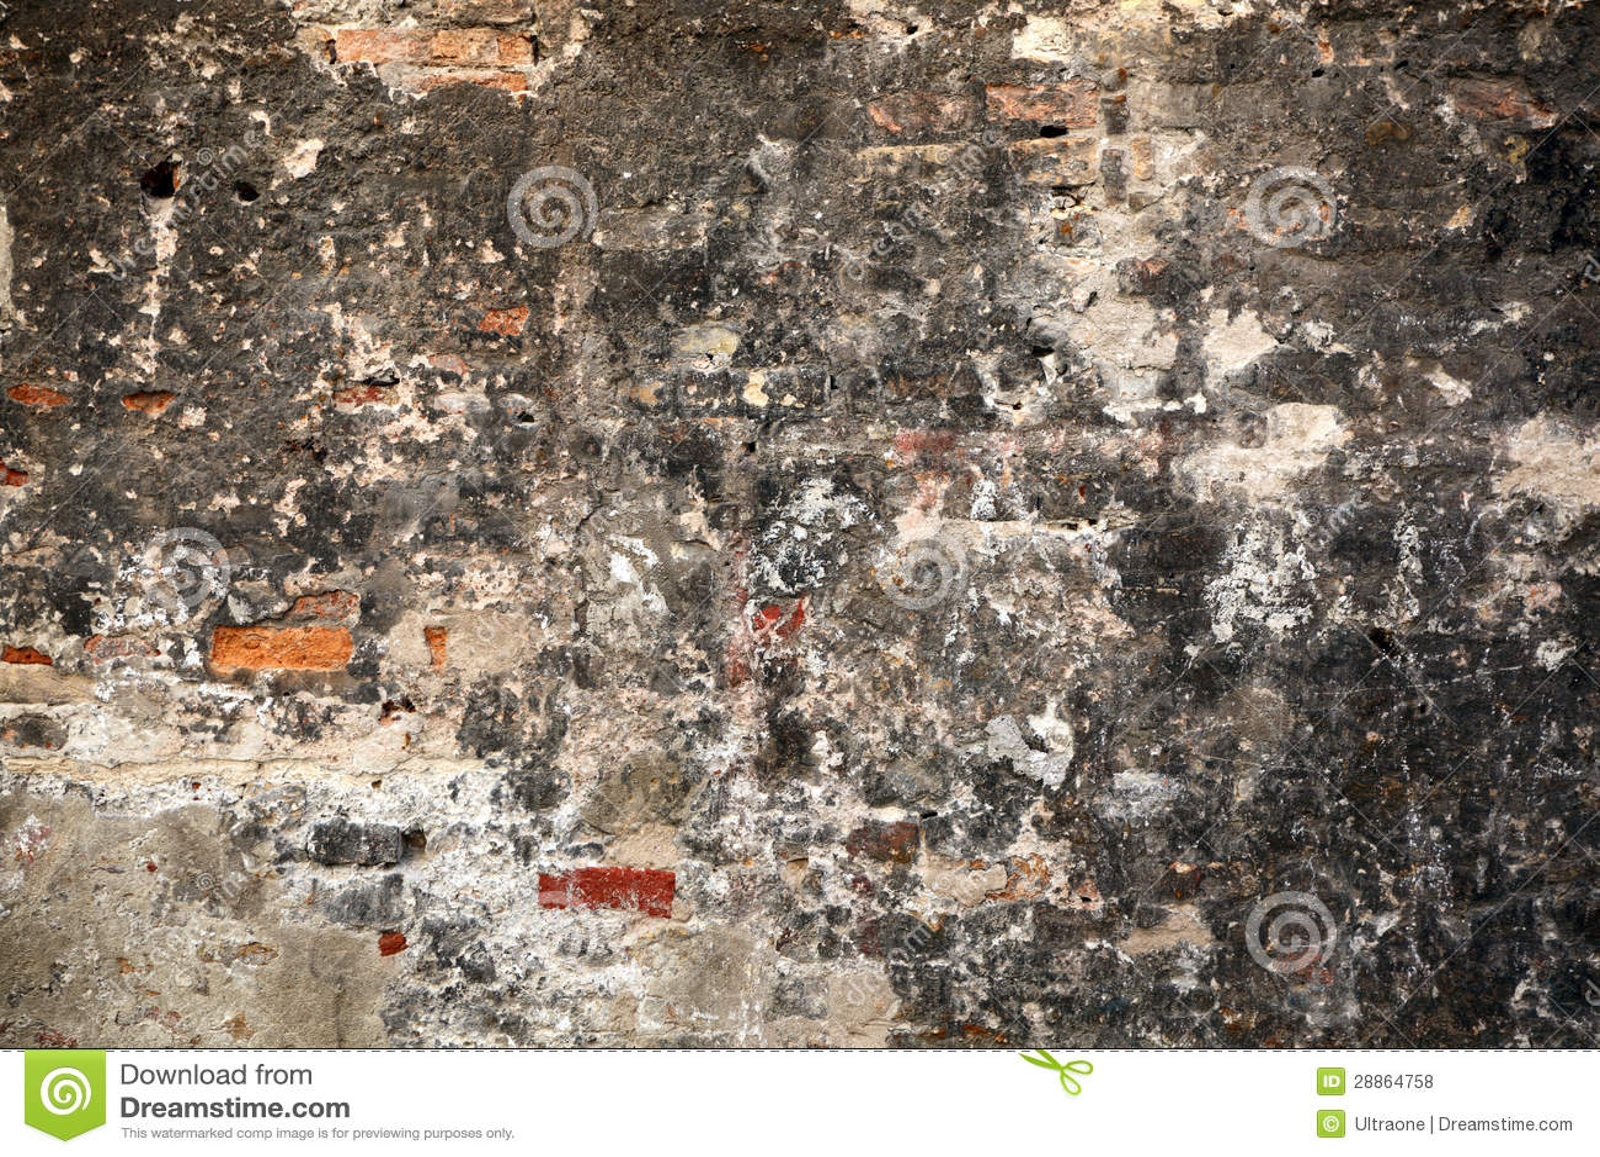 peeling paint on interior walls. Black Bedroom Furniture Sets. Home Design Ideas